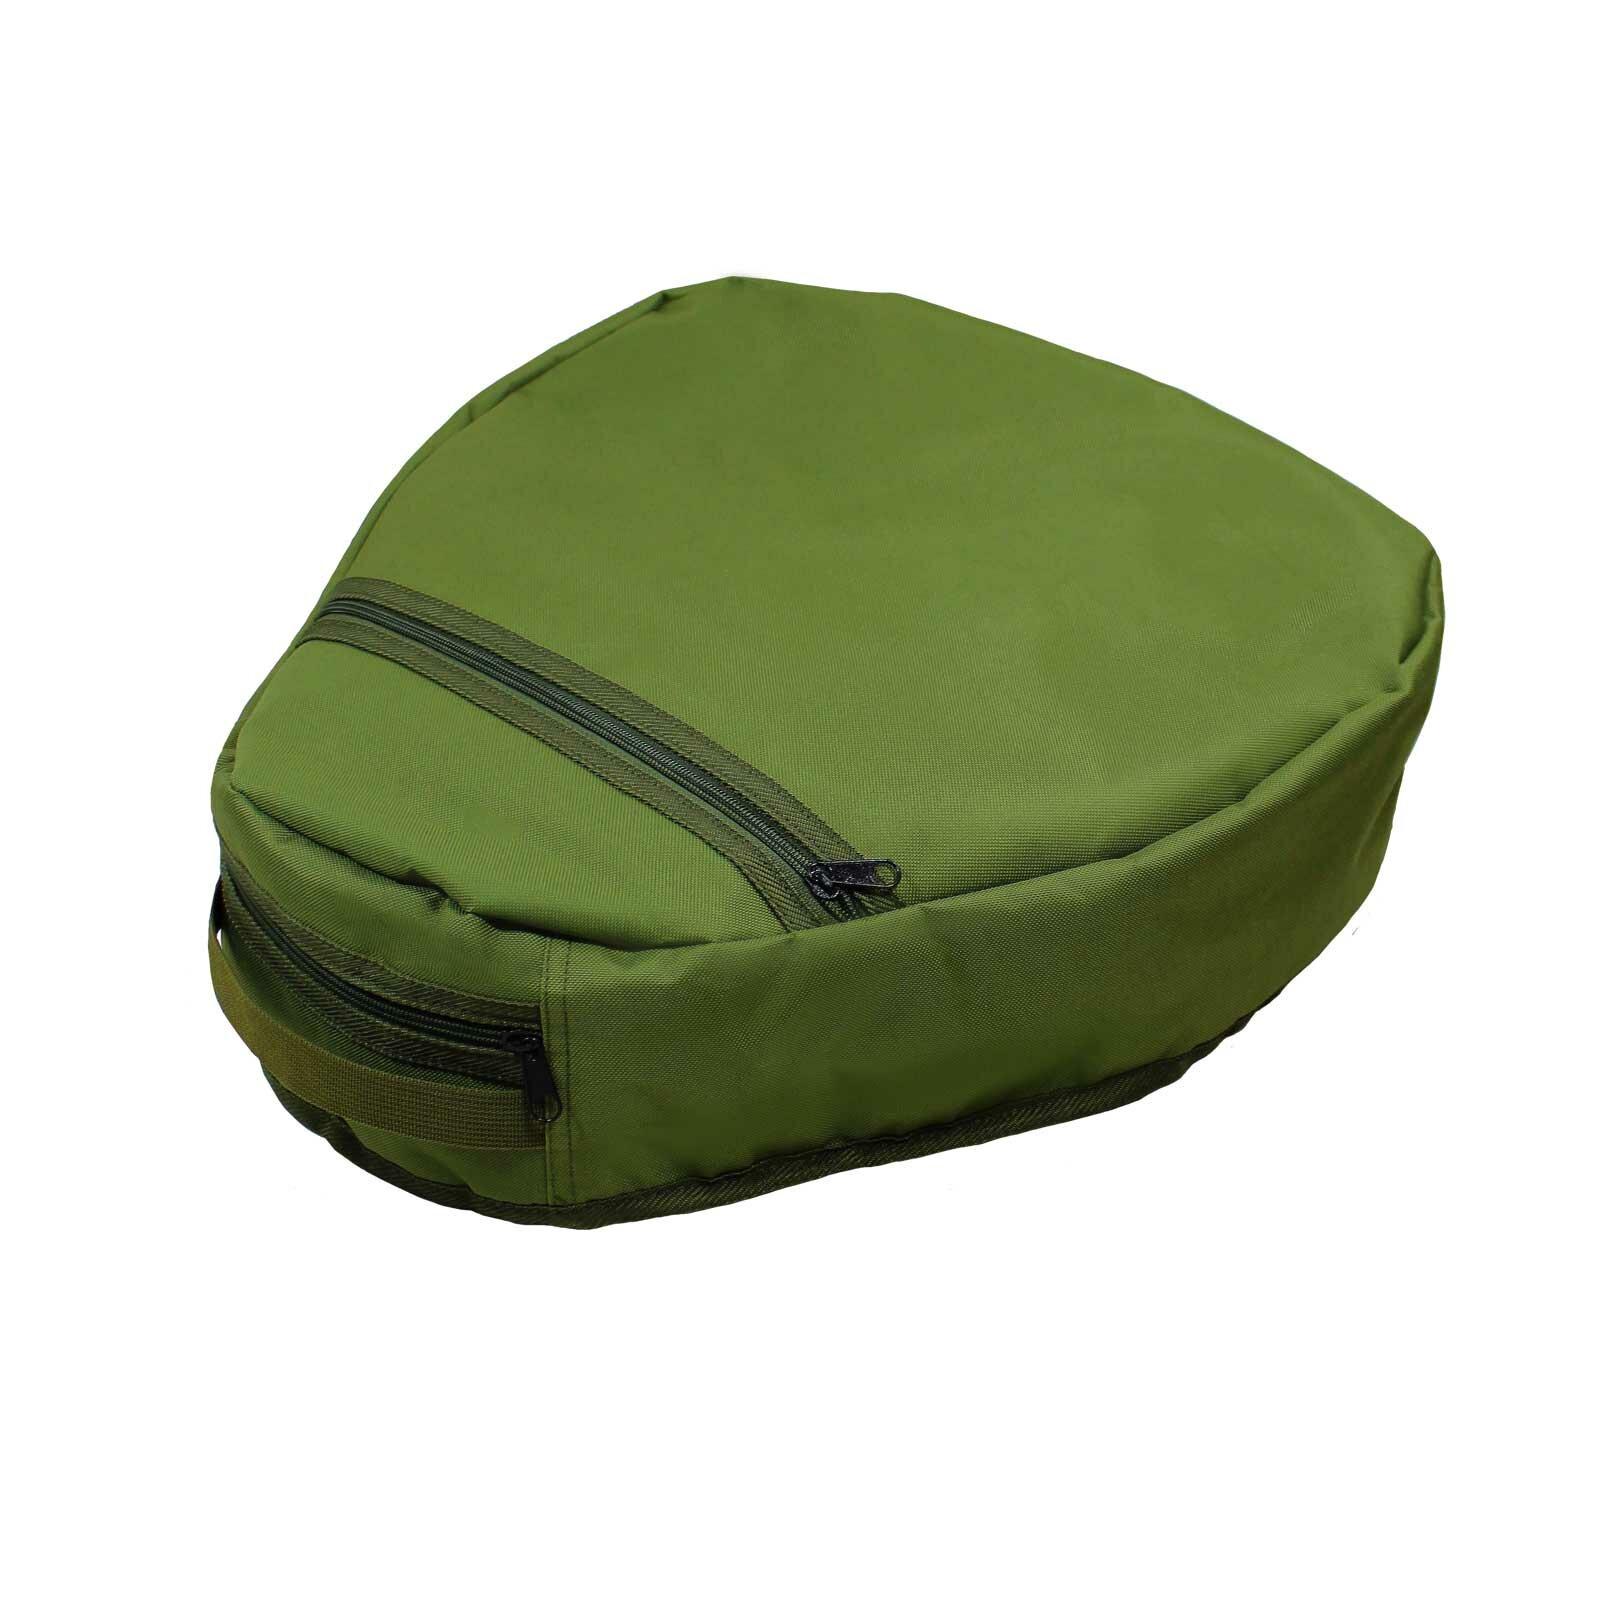 shooting cushion sitzkissen schie kissen gr n. Black Bedroom Furniture Sets. Home Design Ideas